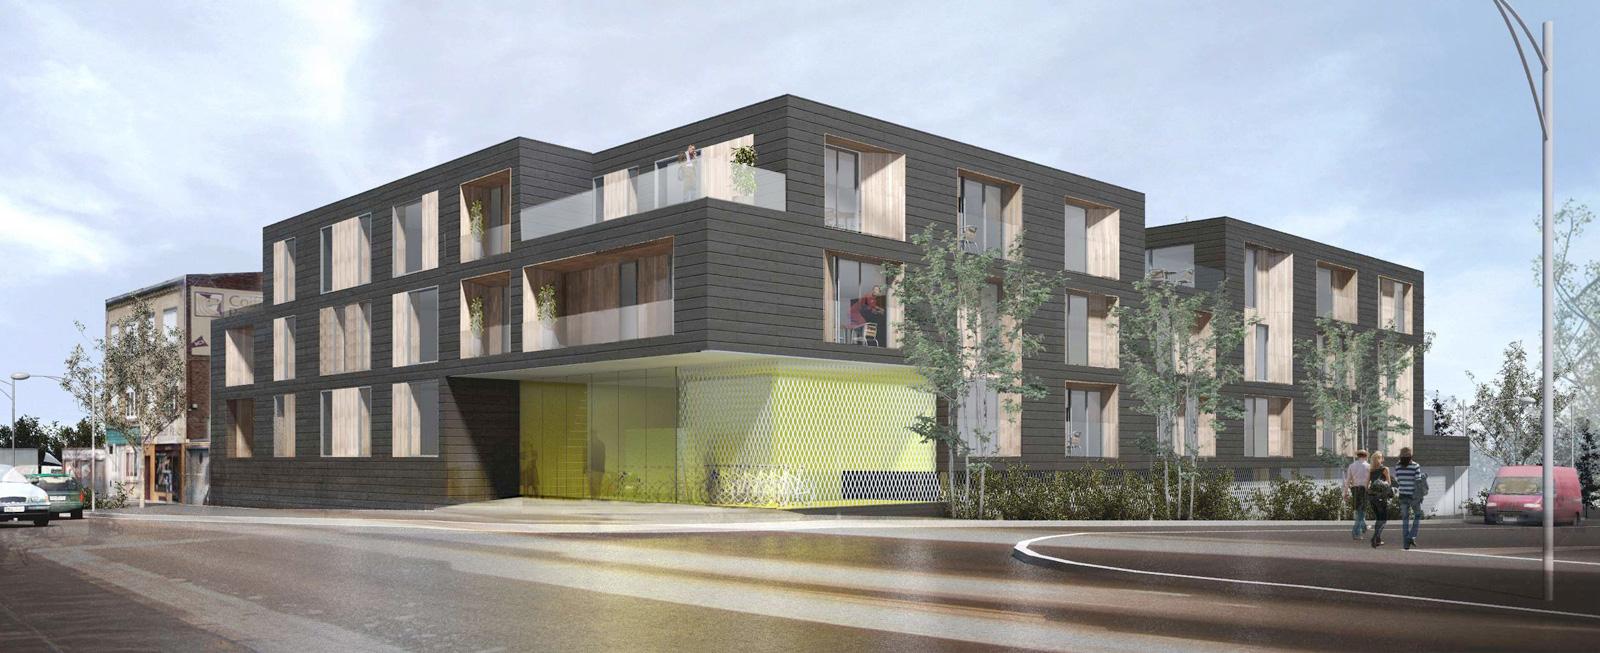 bprom immobilier arras logements neufs arras. Black Bedroom Furniture Sets. Home Design Ideas